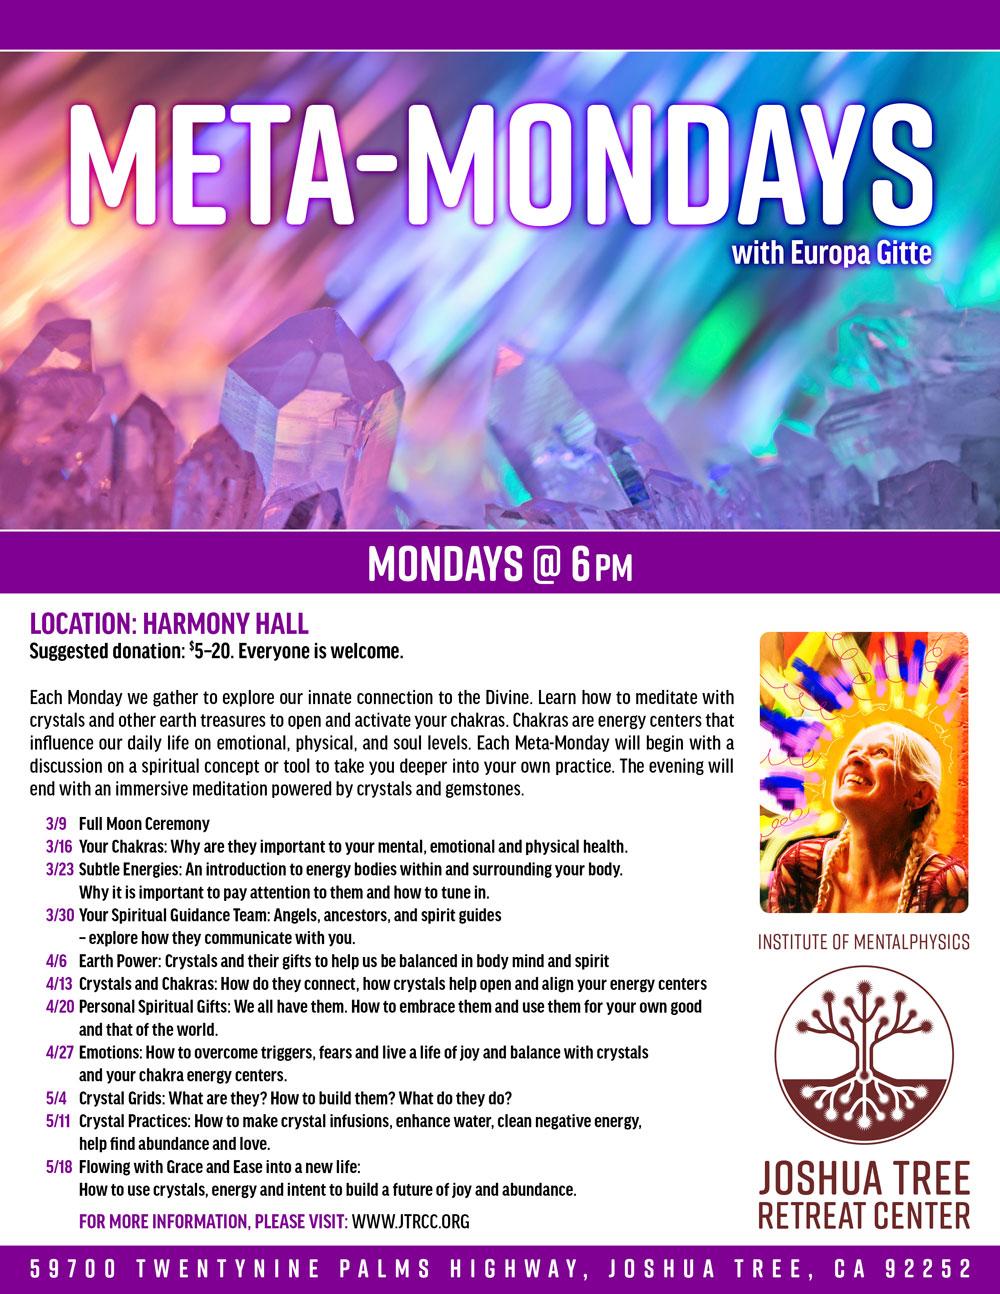 JTRC-Meta-Mondays